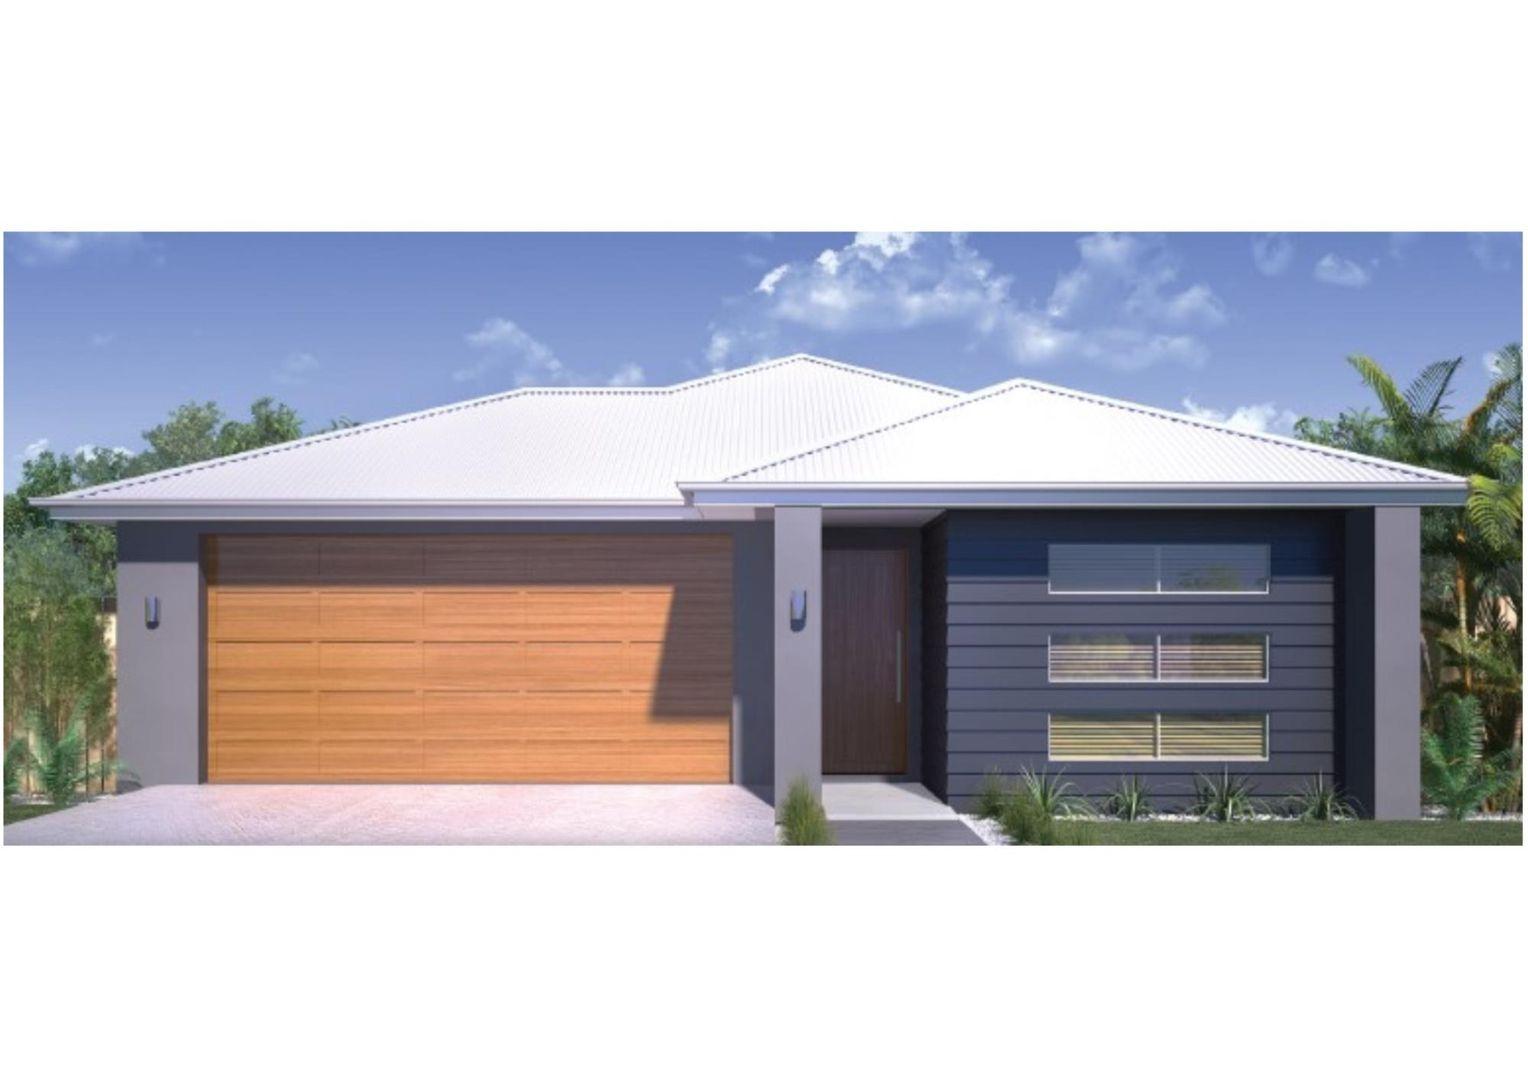 LOT 161 ESSENCE ESTATE, Toowoomba QLD 4350, Image 0